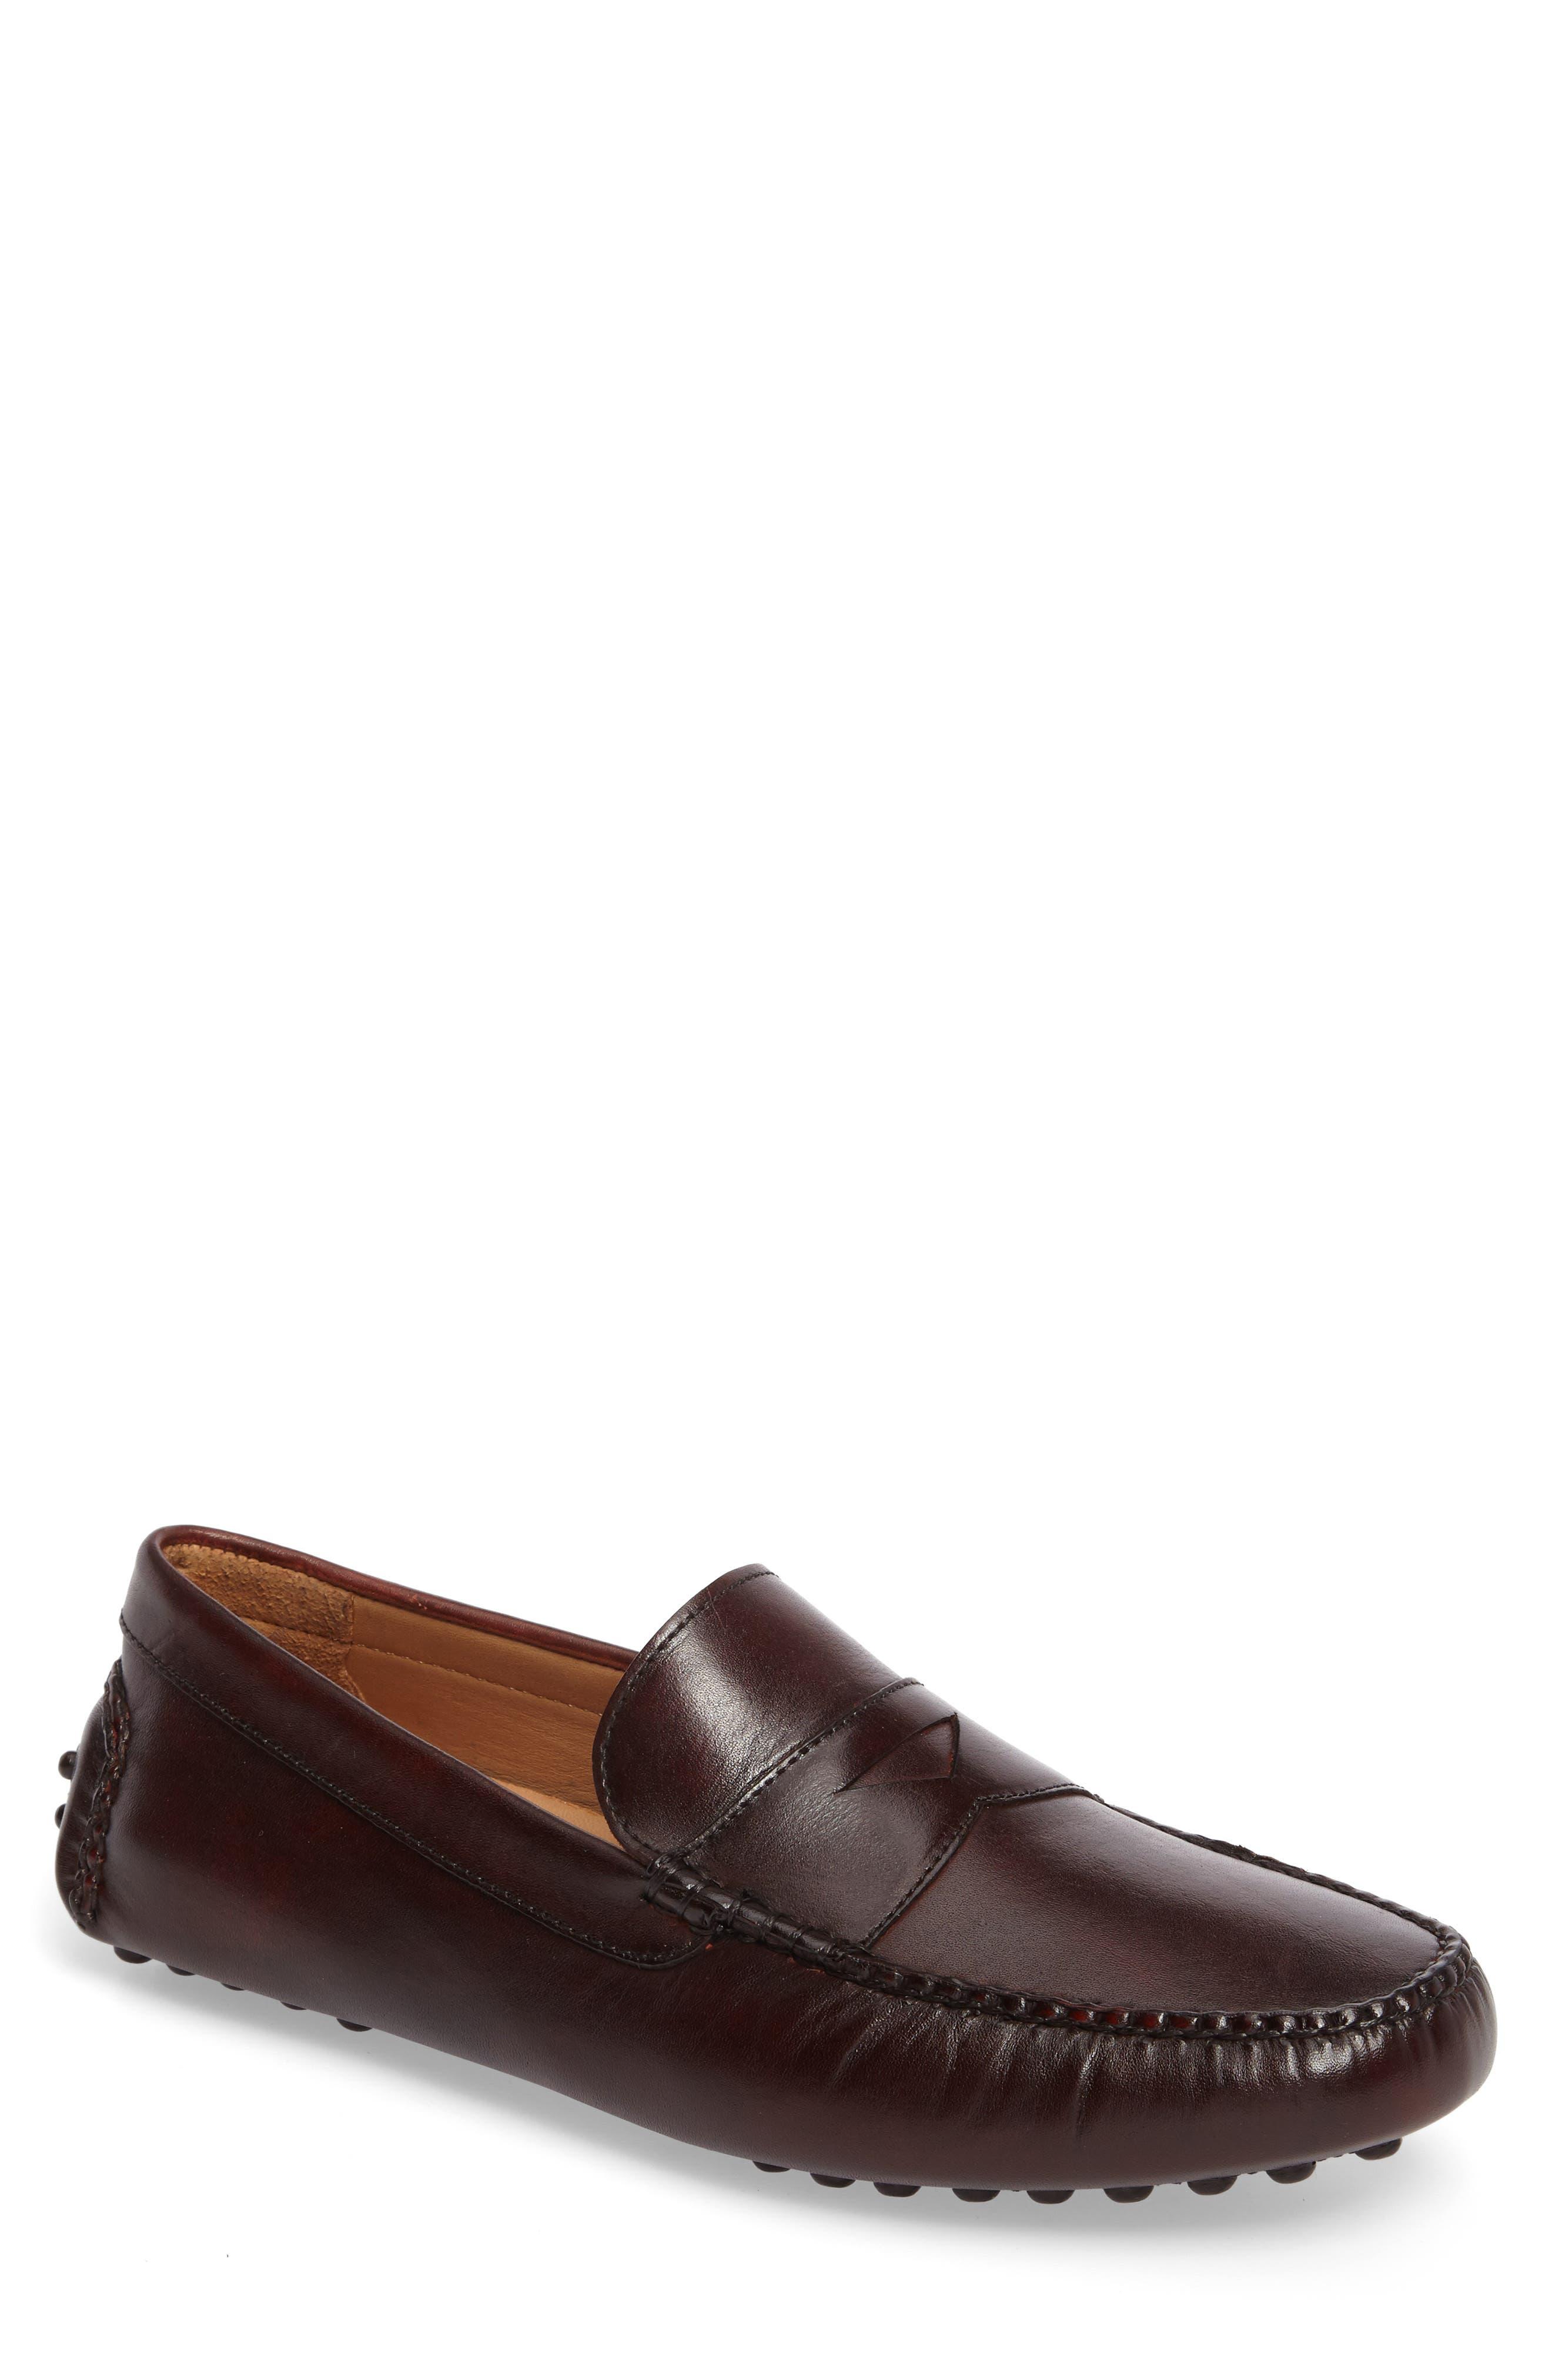 Main Image - John W. Nordstrom® Eaton Driving Shoe (Men)